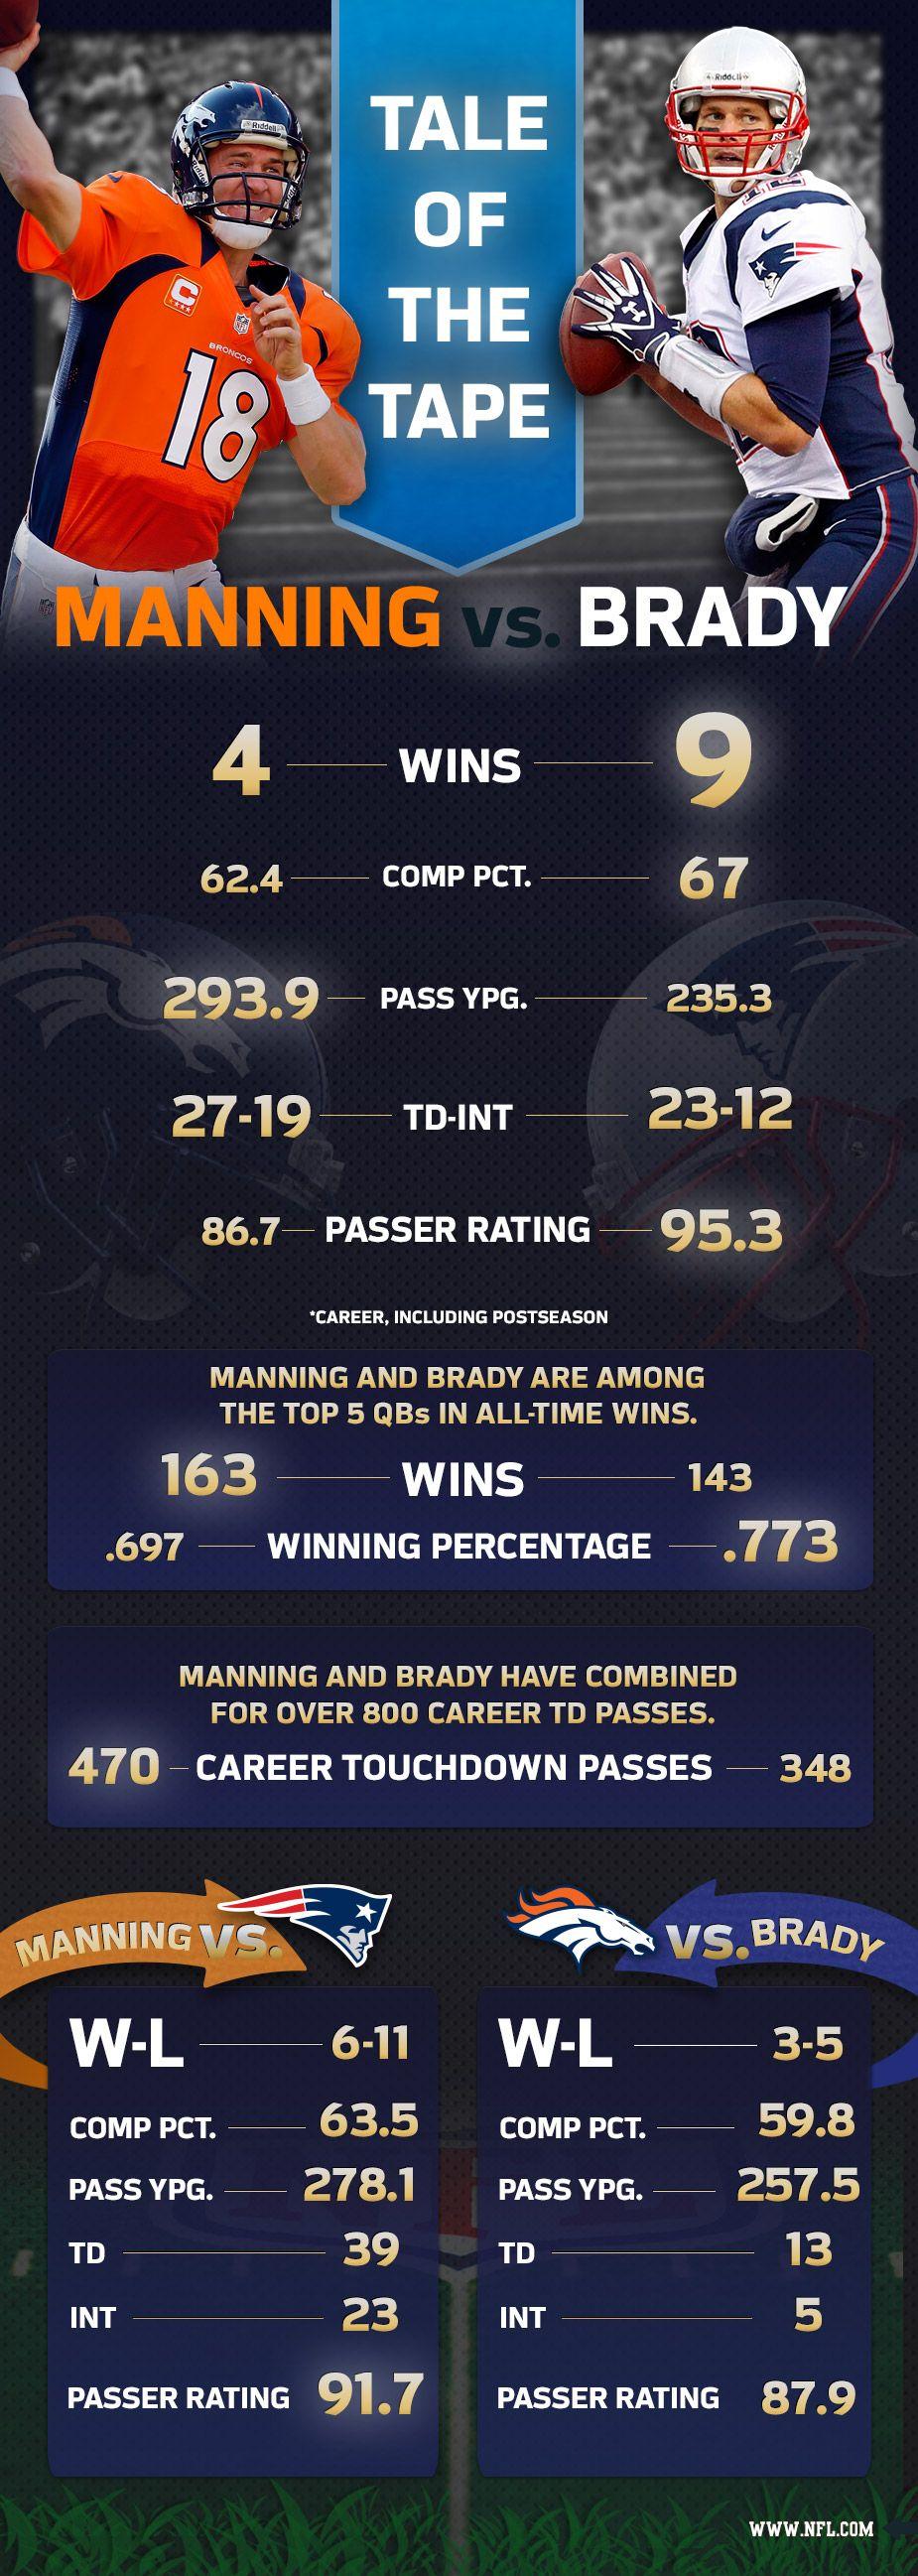 Tale Of The Tape Peyton Manning Vs Tom Brady Peyton Manning Manning Peyton Manning Quotes